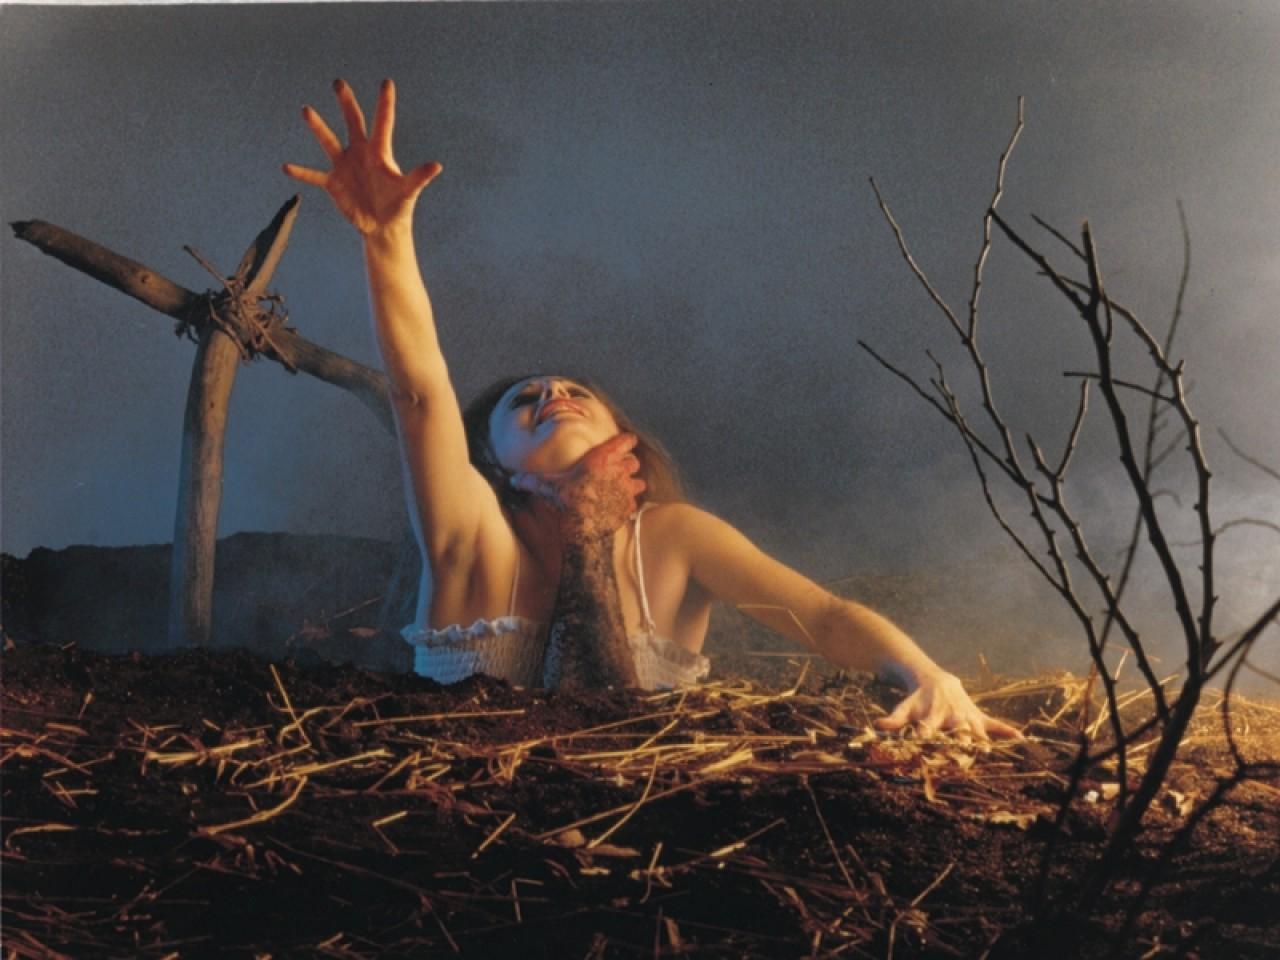 Evil dead – Sam Raimi